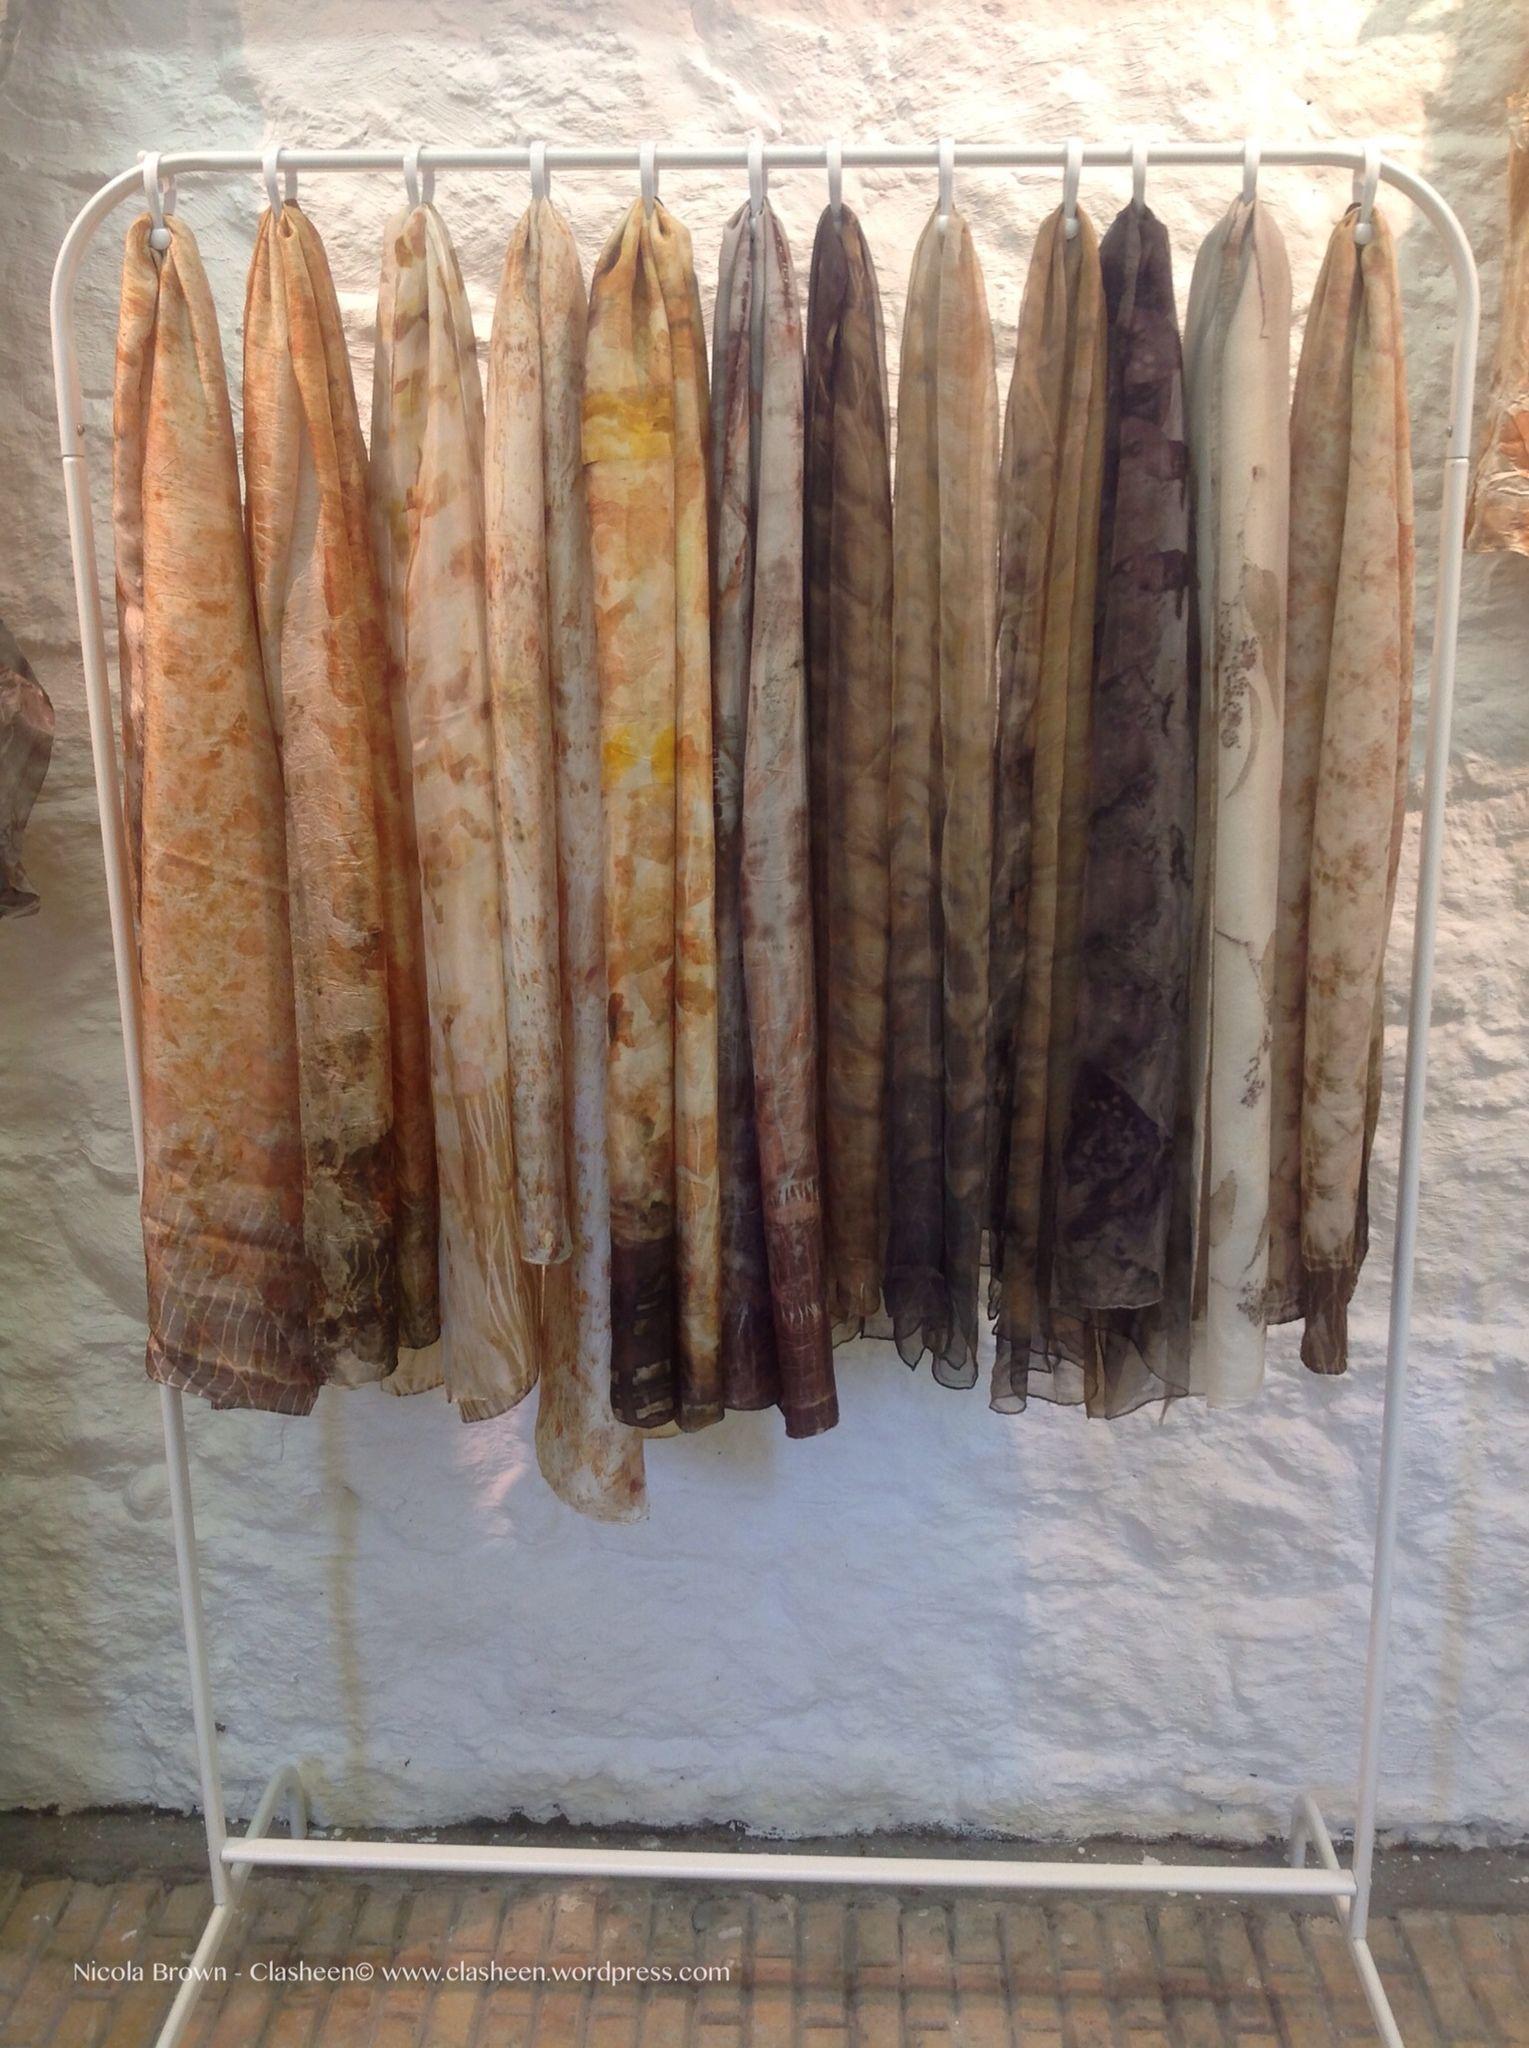 Craft fair and studio scarf display DIY